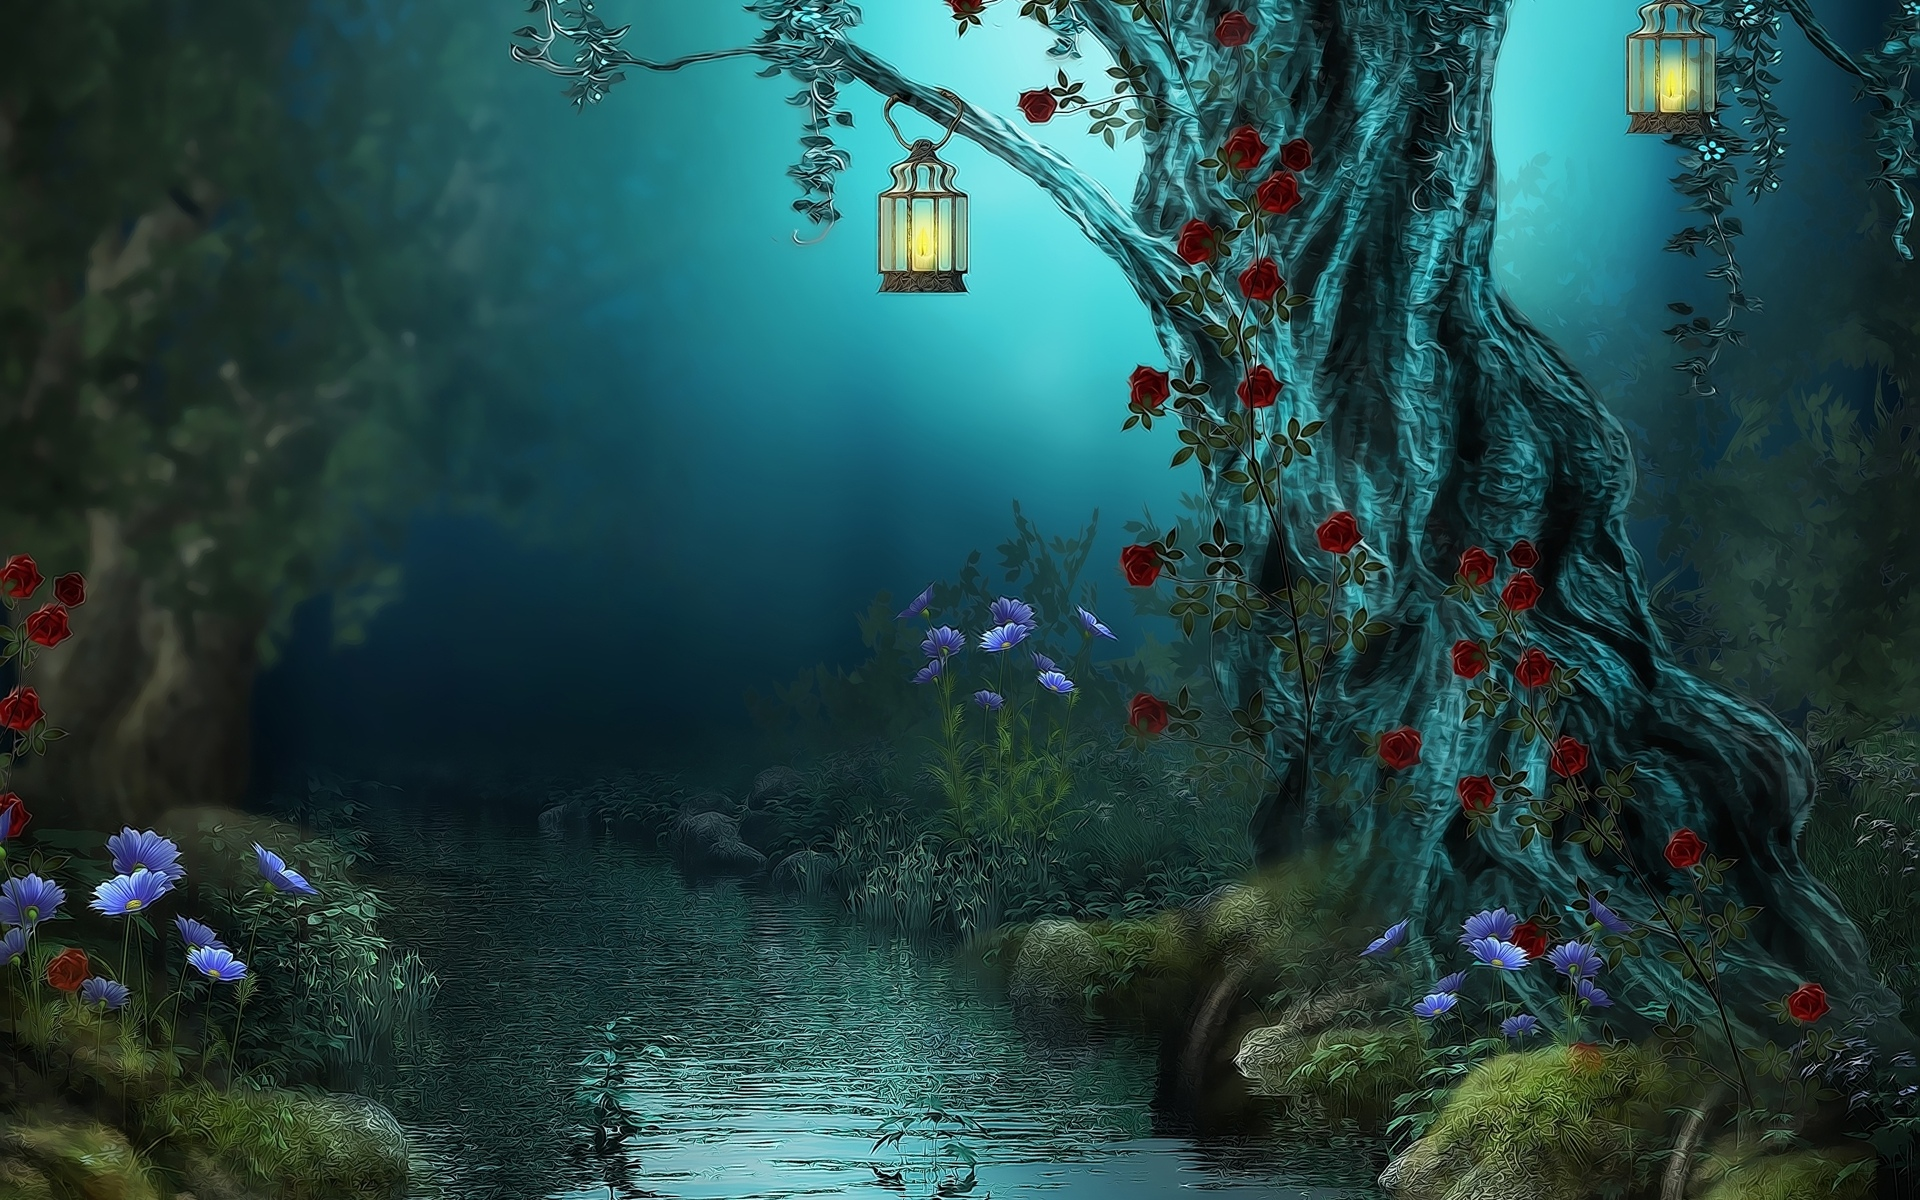 magical fantasy landscapes landscape - photo #30